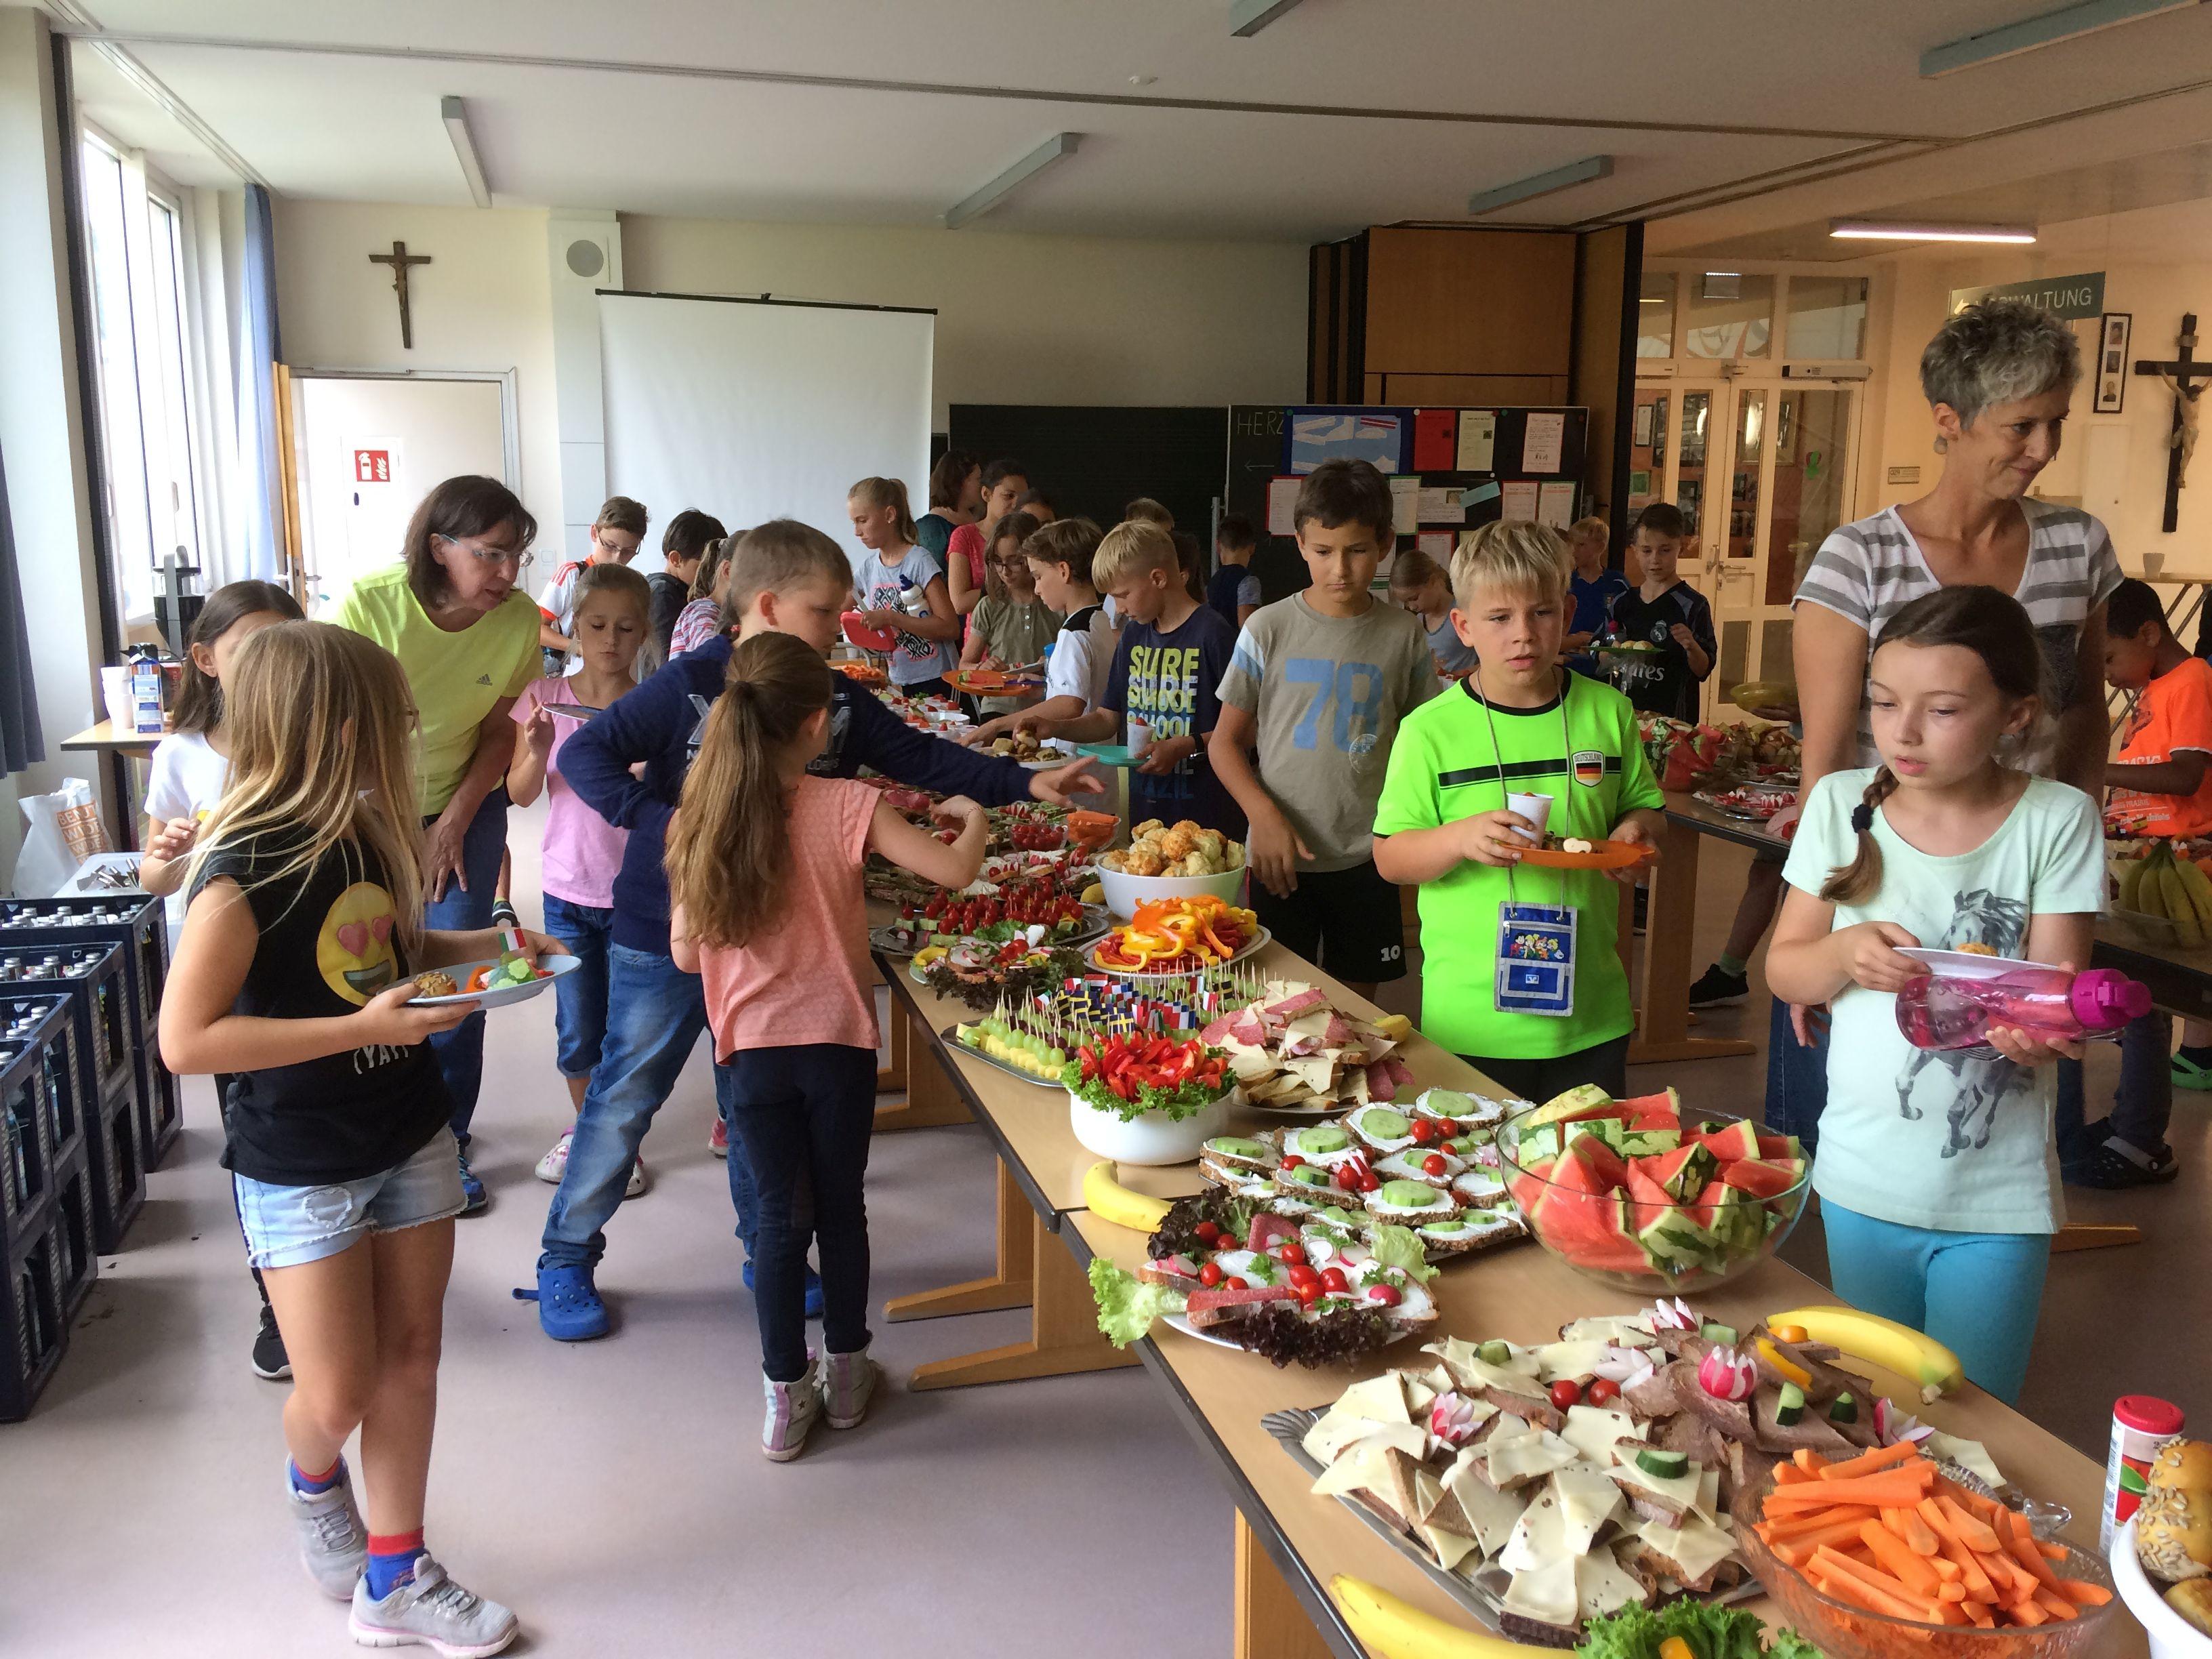 Schulfest gesunden Buffet des Elternbeirats